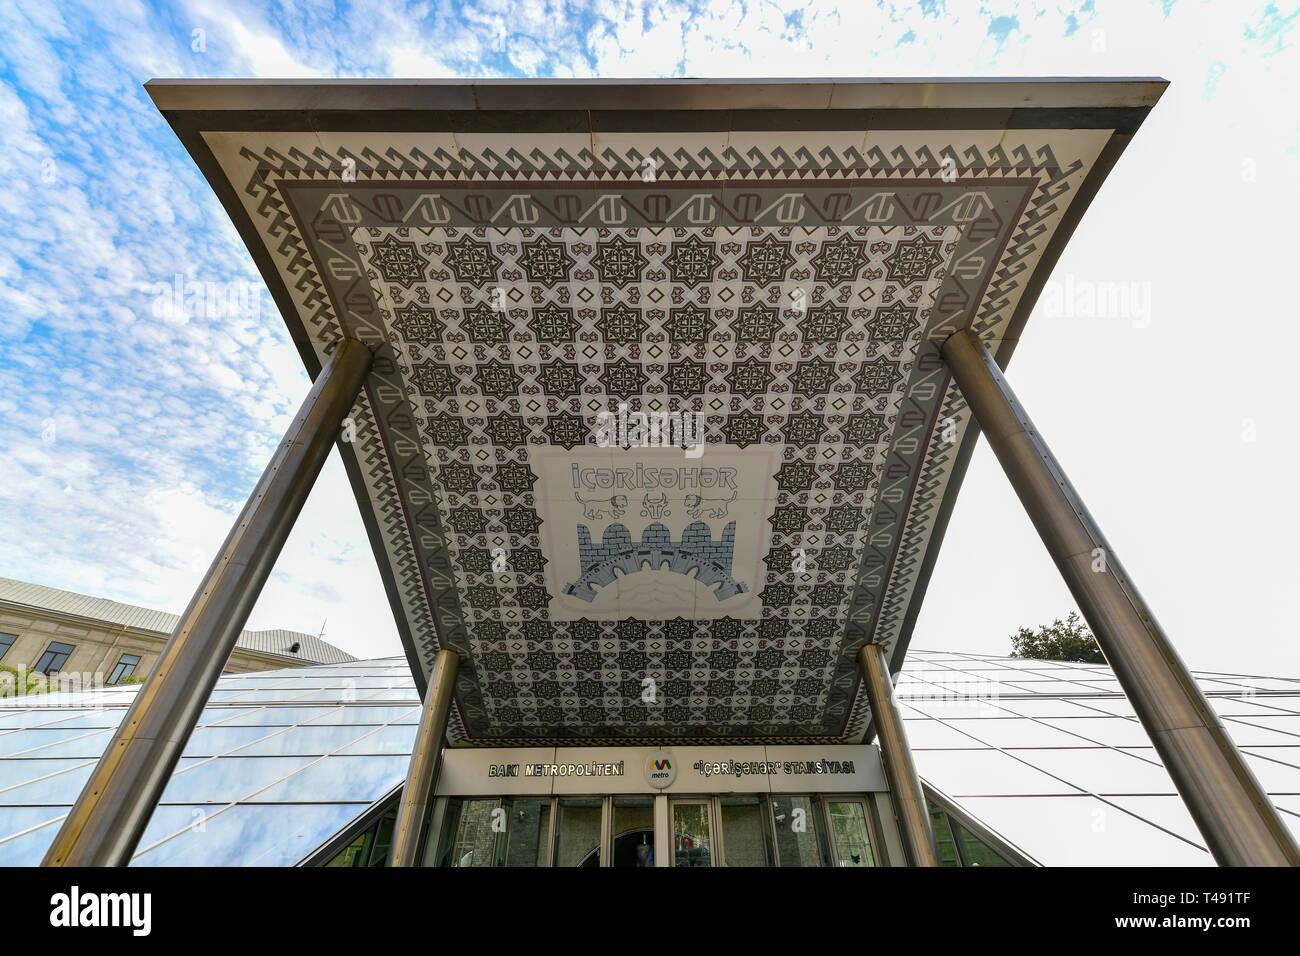 Baku, Azerbaijan - July 15, 2018: Entrance to the metro station Icheri Sheher (Old City) of Baku, Azerbaijan. - Stock Image